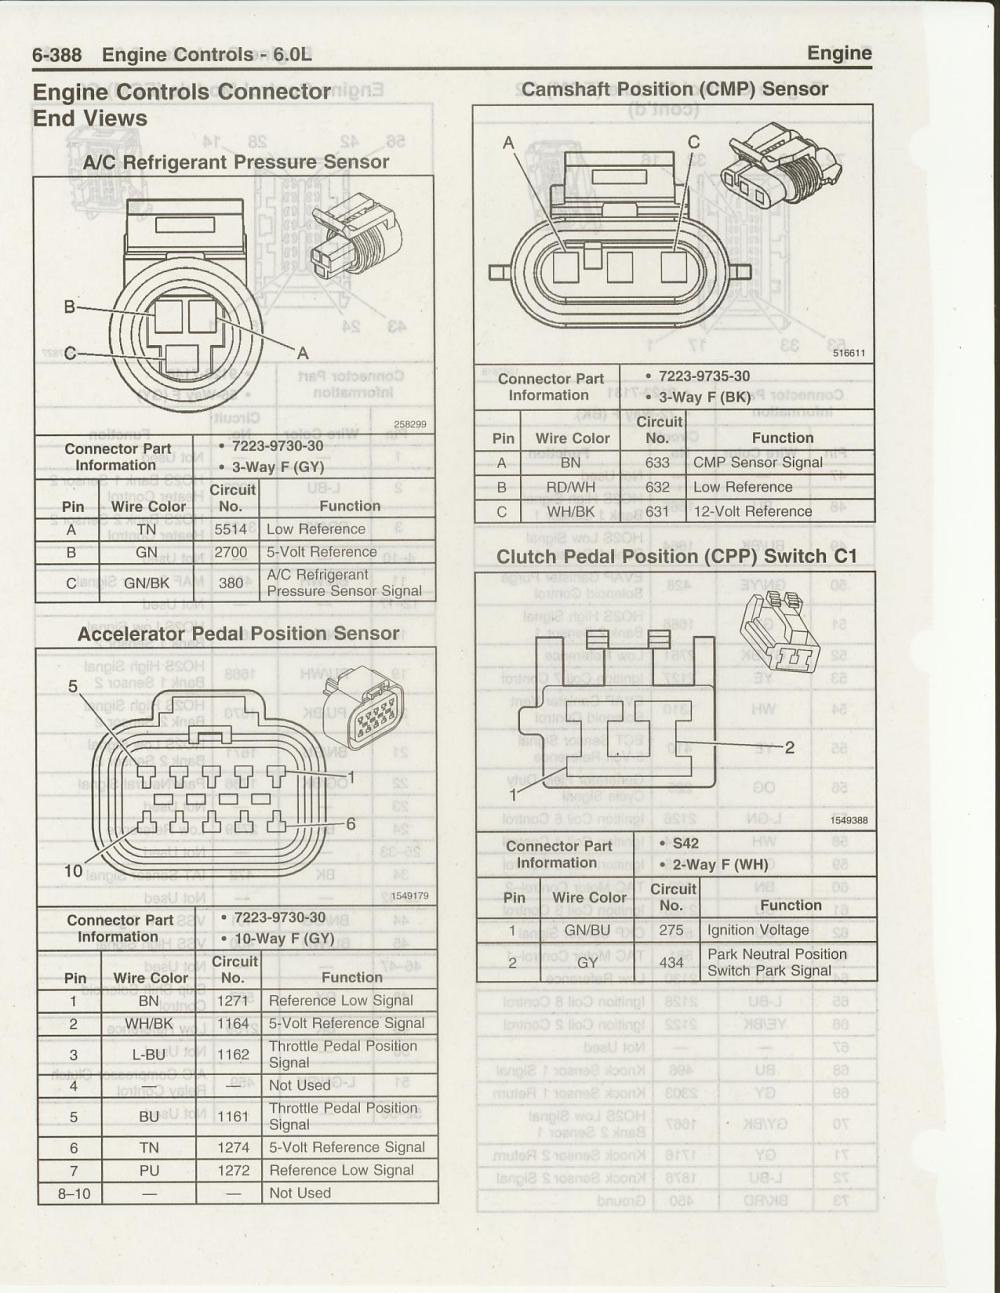 medium resolution of 2006 gto map iat wiring diagram wiring library rh 26 evitta de 1964 gto dash wiring diagram 1964 gto dash wiring diagram